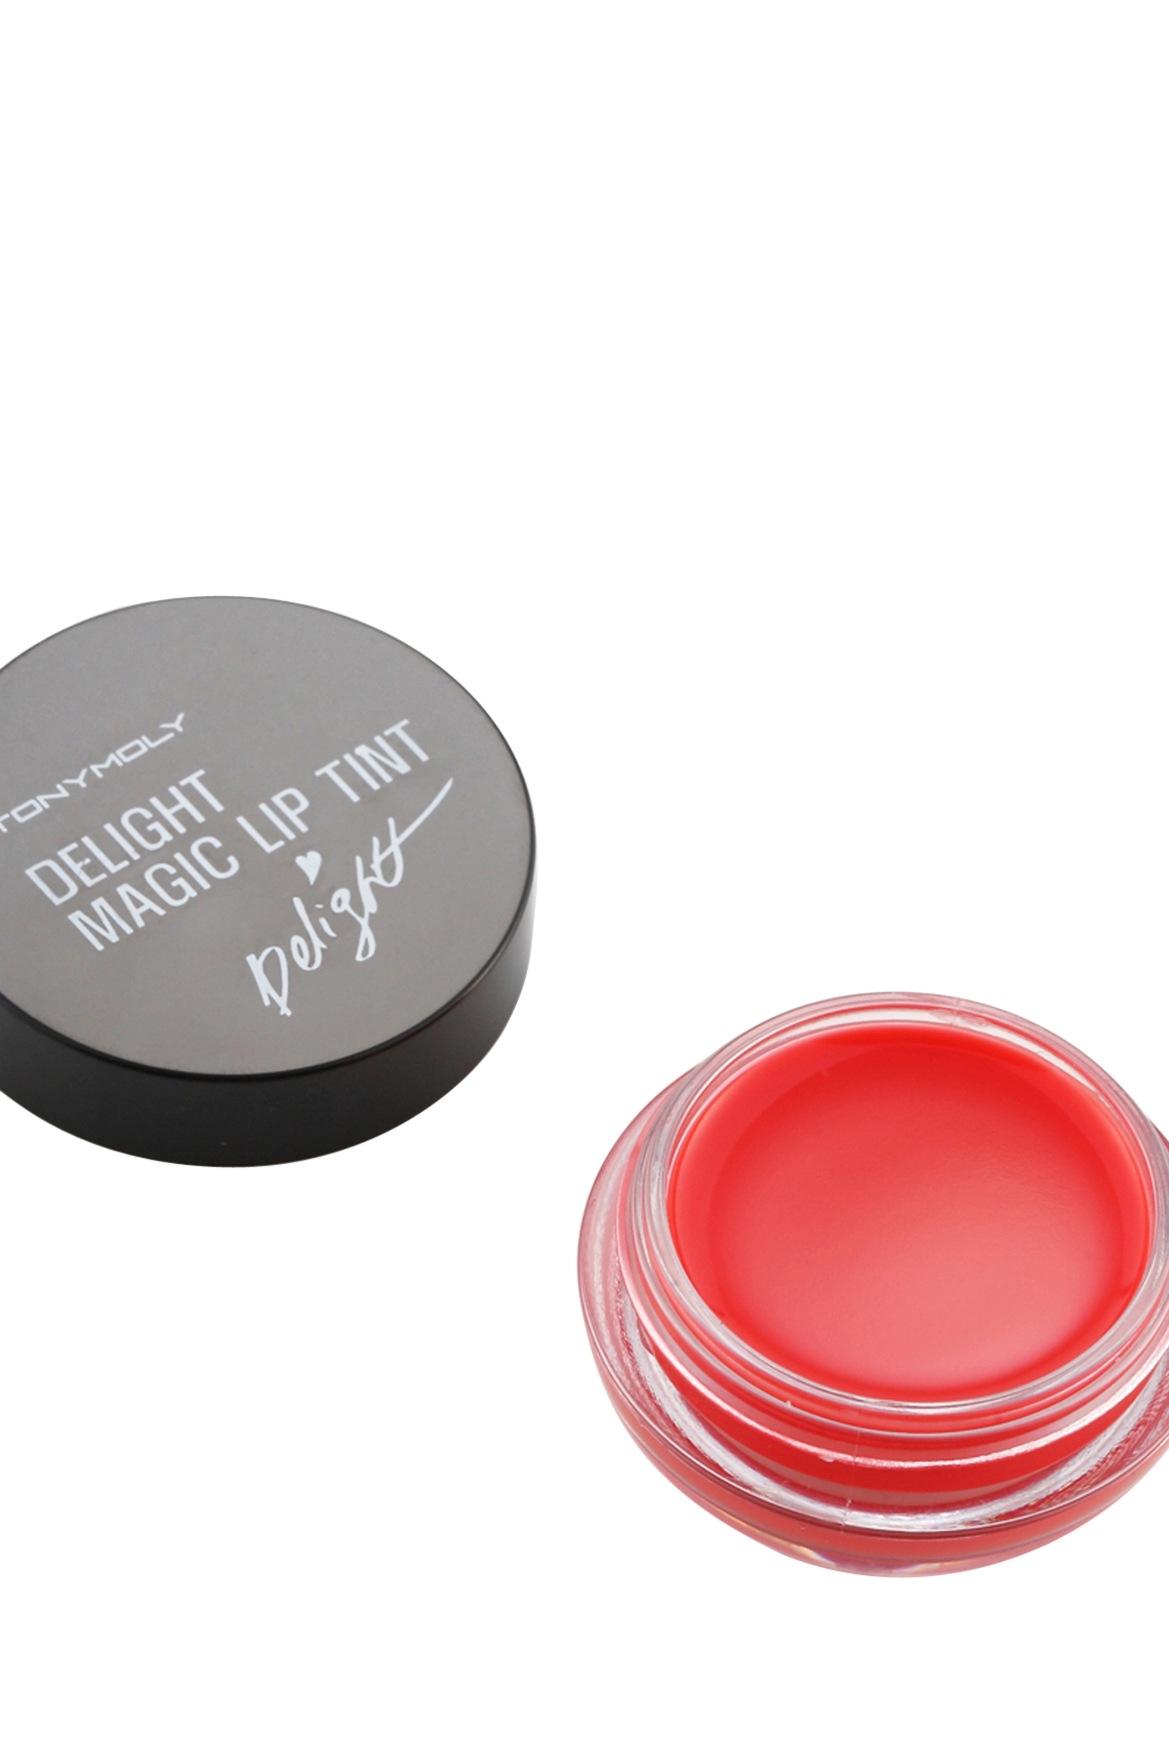 Tonymoly Delight Magic Lip3 Myer Online Tony Moly Lip Tint